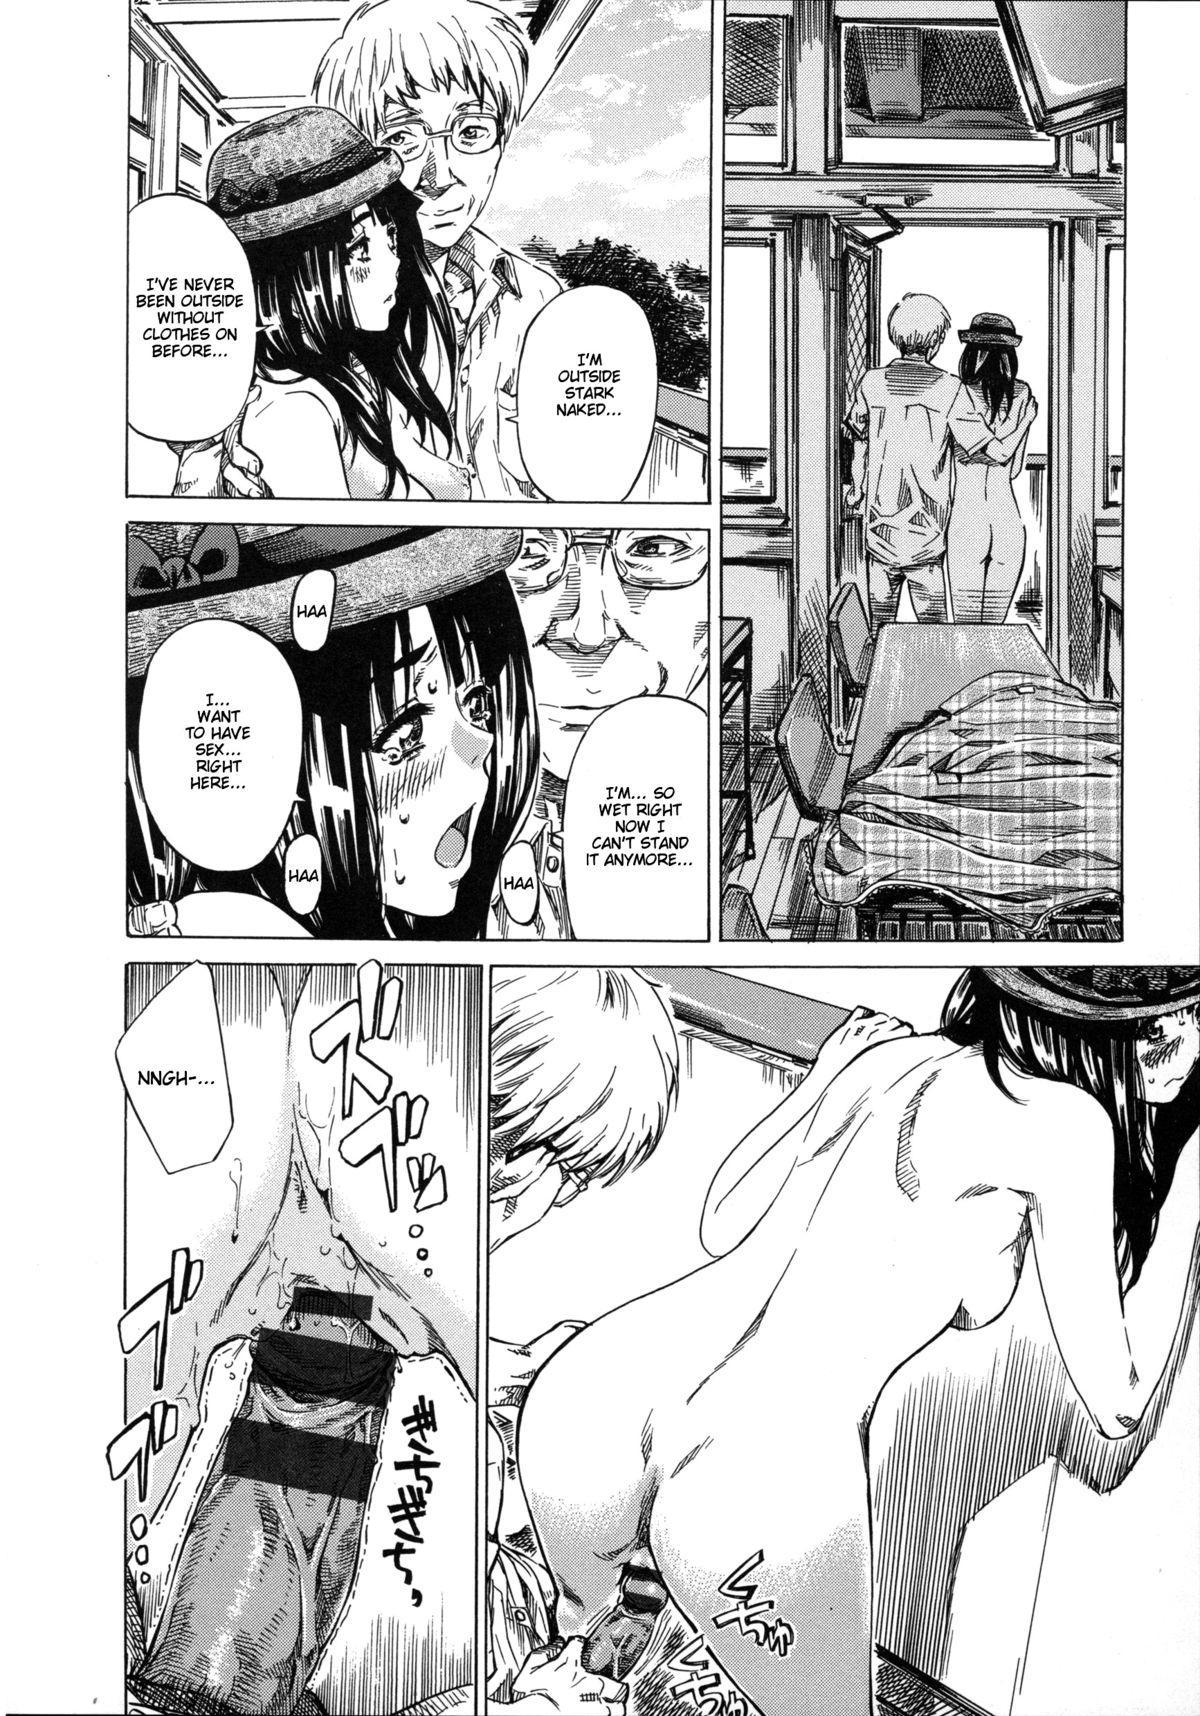 Kashiwazaki Miki wa Ironna Basho de Zenra Sanpo Shitemita | Miki Kashiwazaki Goes Naked in All Sorts of Places 19